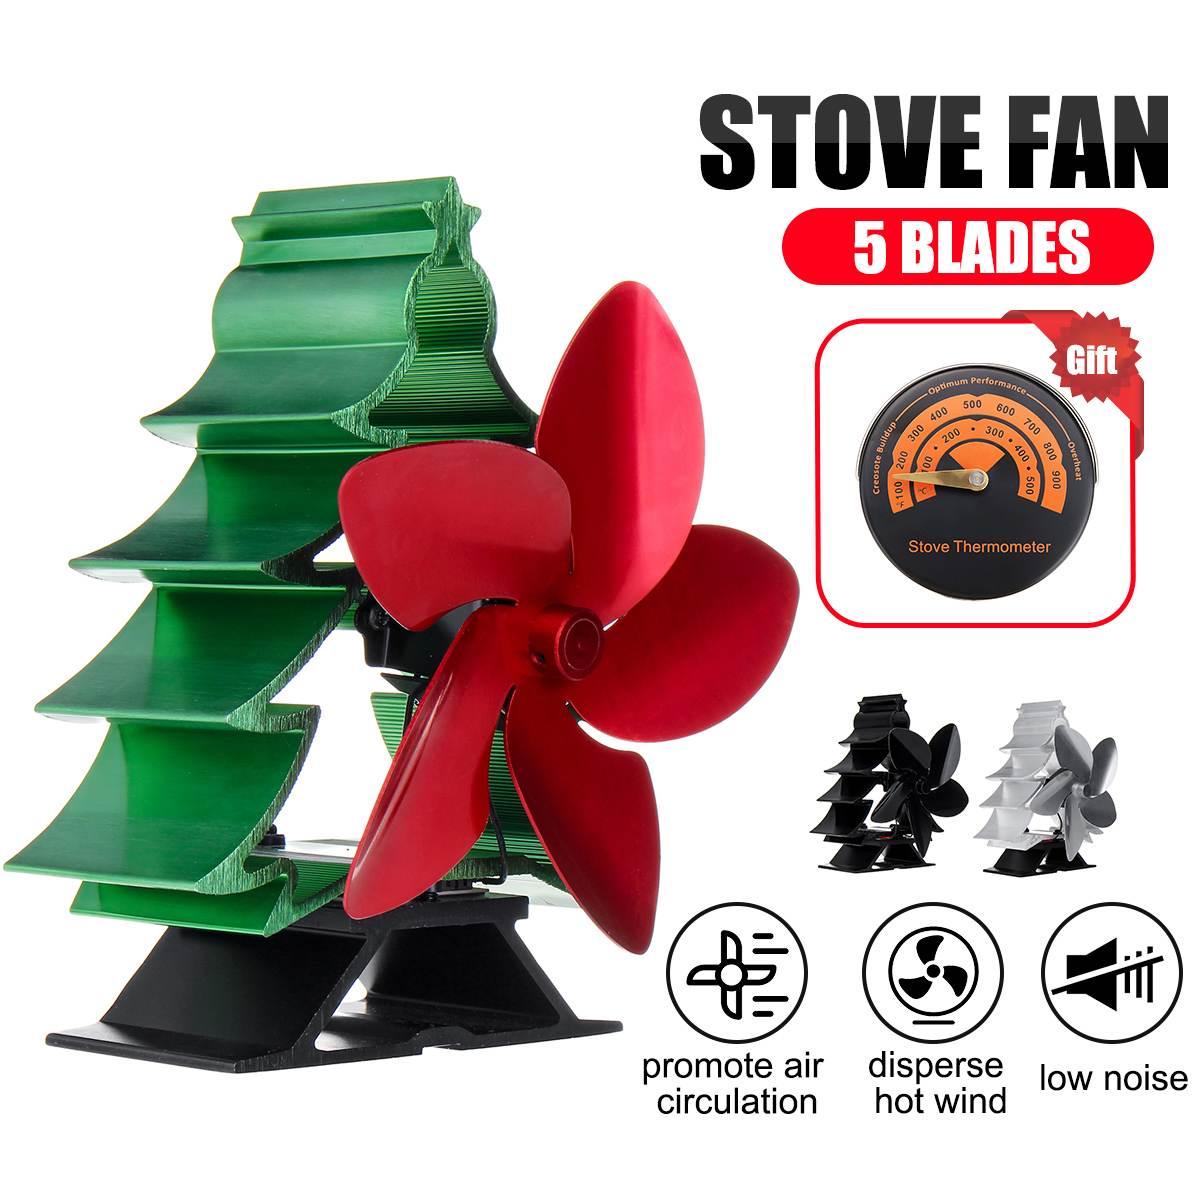 180-250CFM 5 Blade Heat Fireplace Fan Stove Fan Powered Stove Fan Eco Friendly Quiet Fan Heat Distribution Fuel Saving With Gift